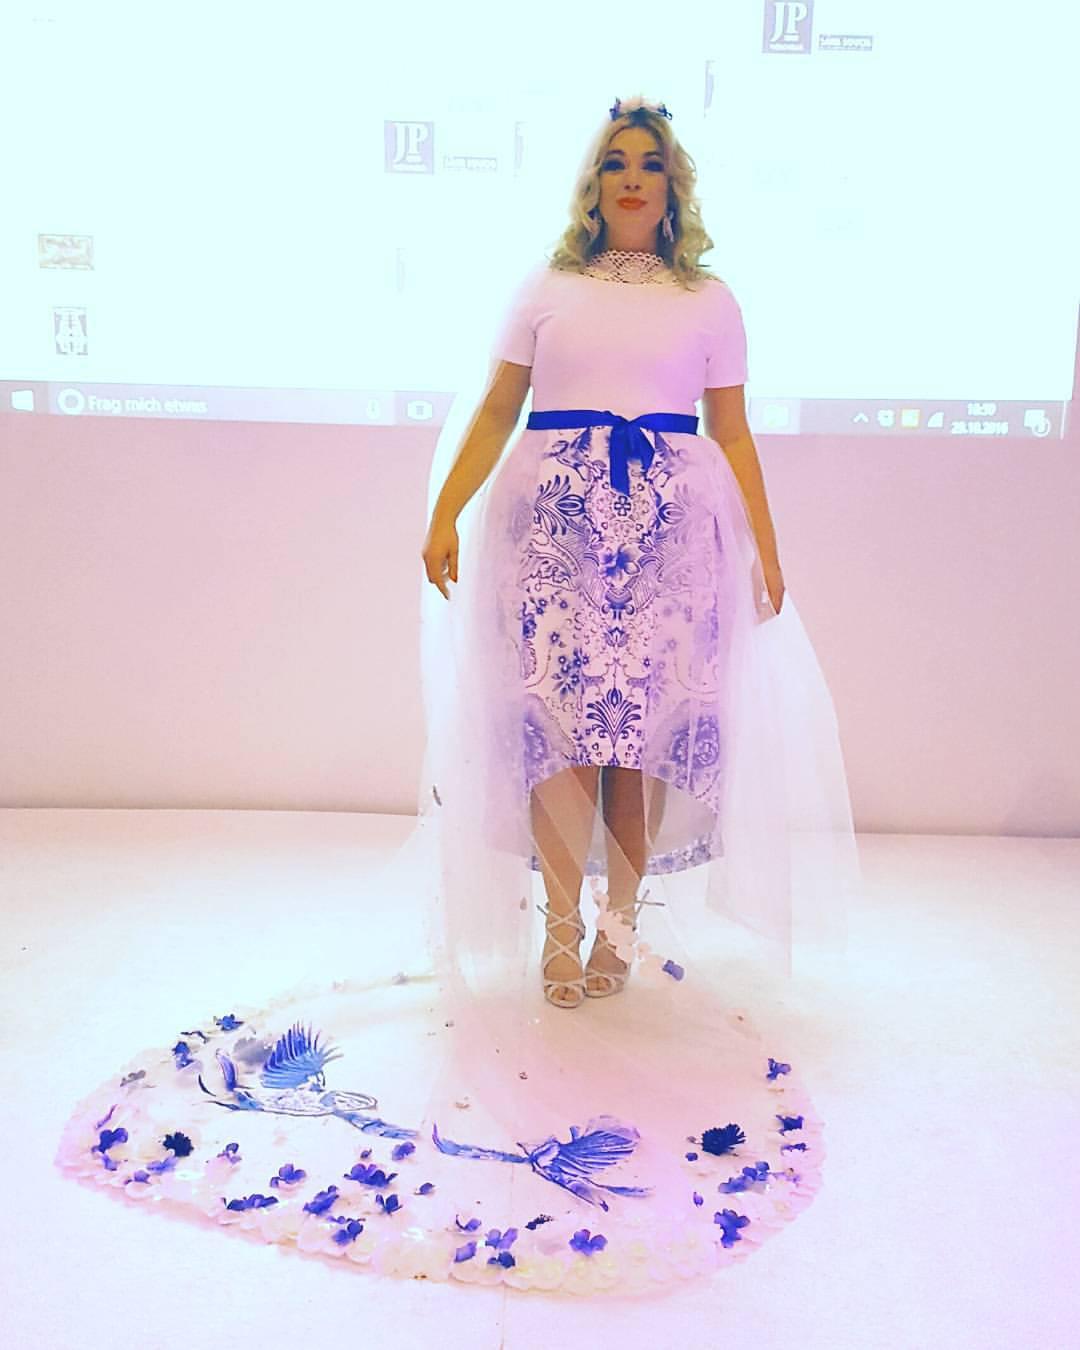 Plussize-megabambi-caterina-pogorzelski-curvymodel-Fashionblogger-mable